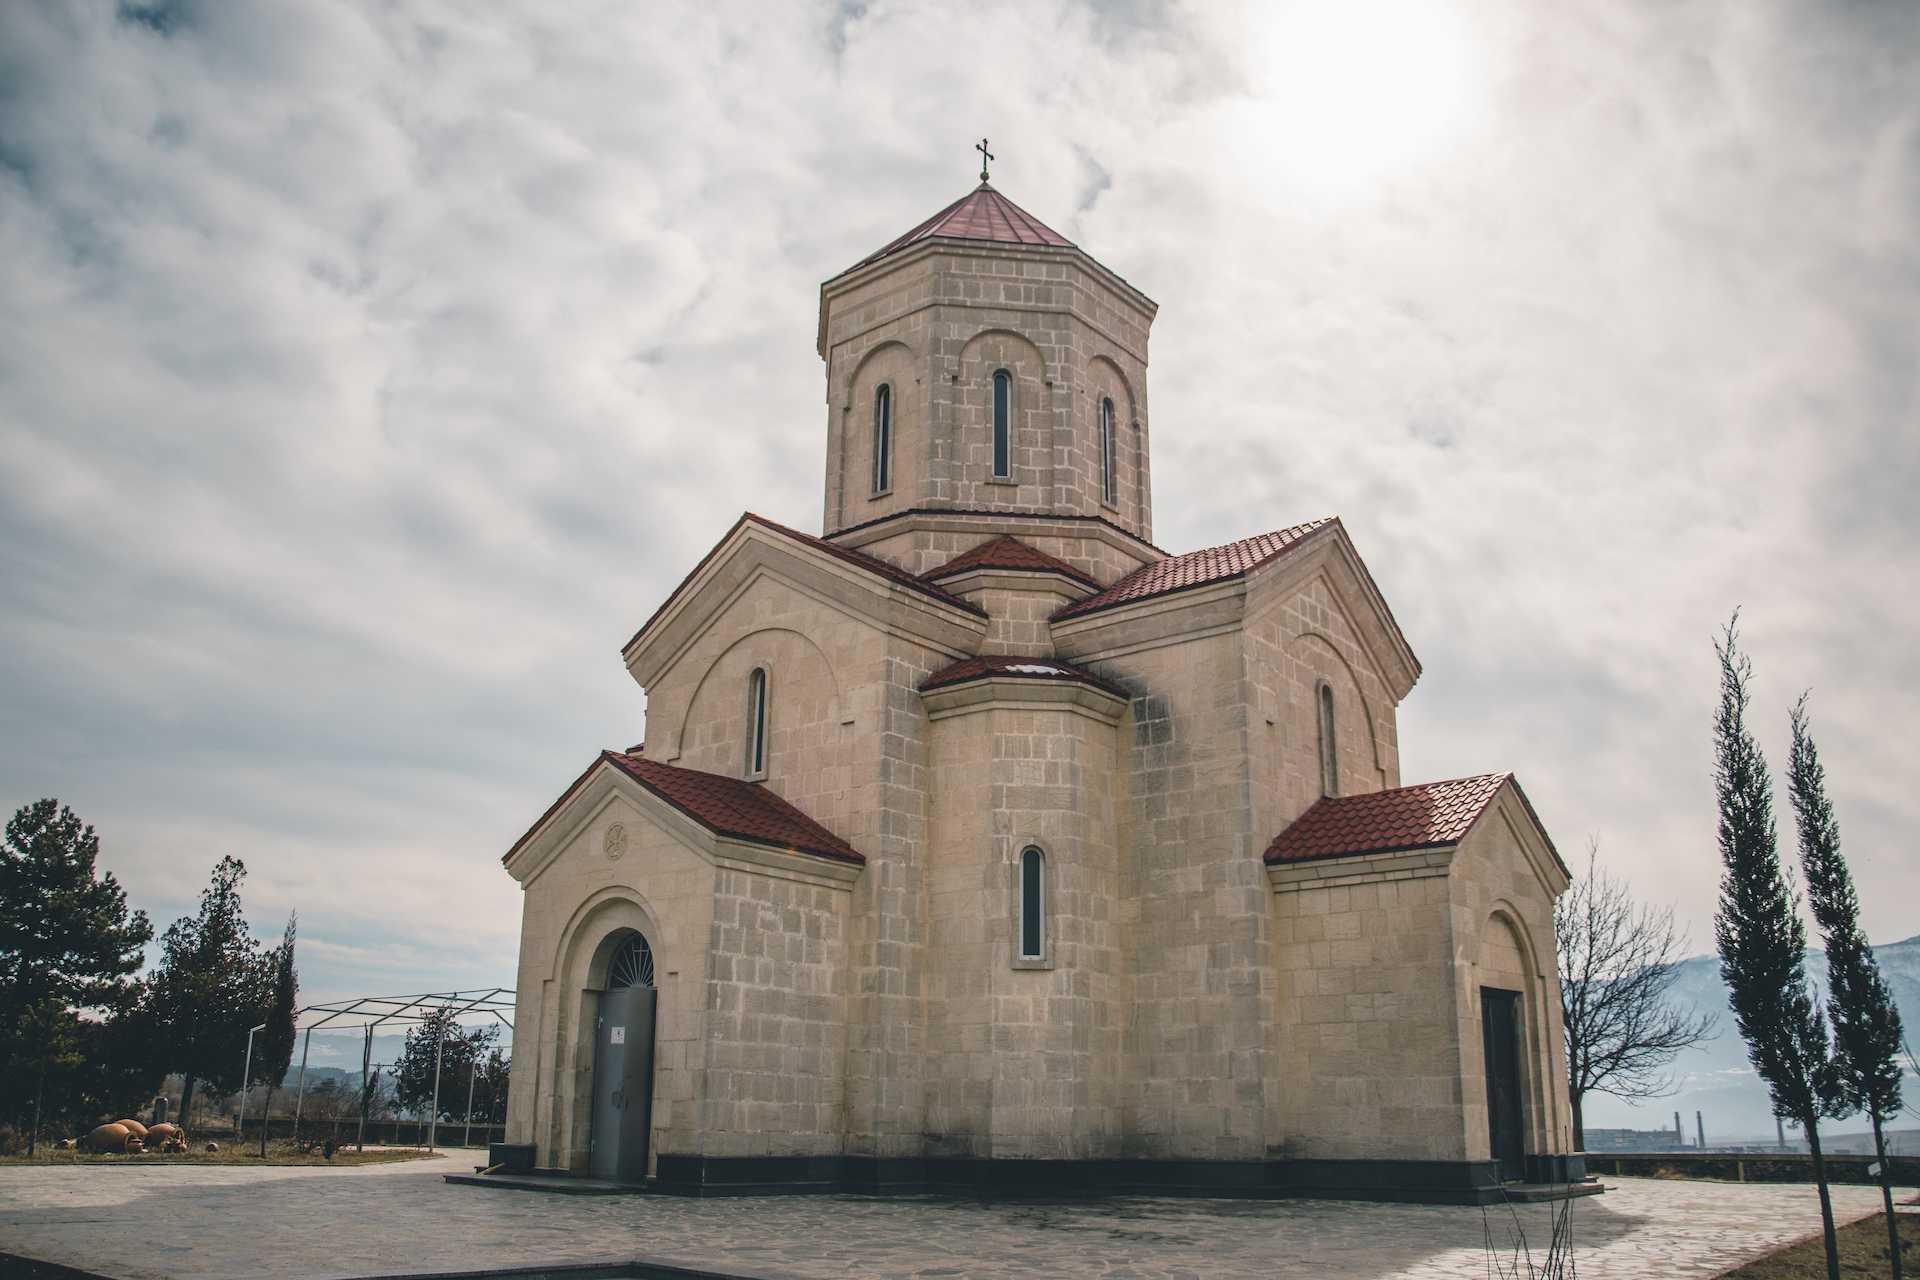 Gruzja atrakcje